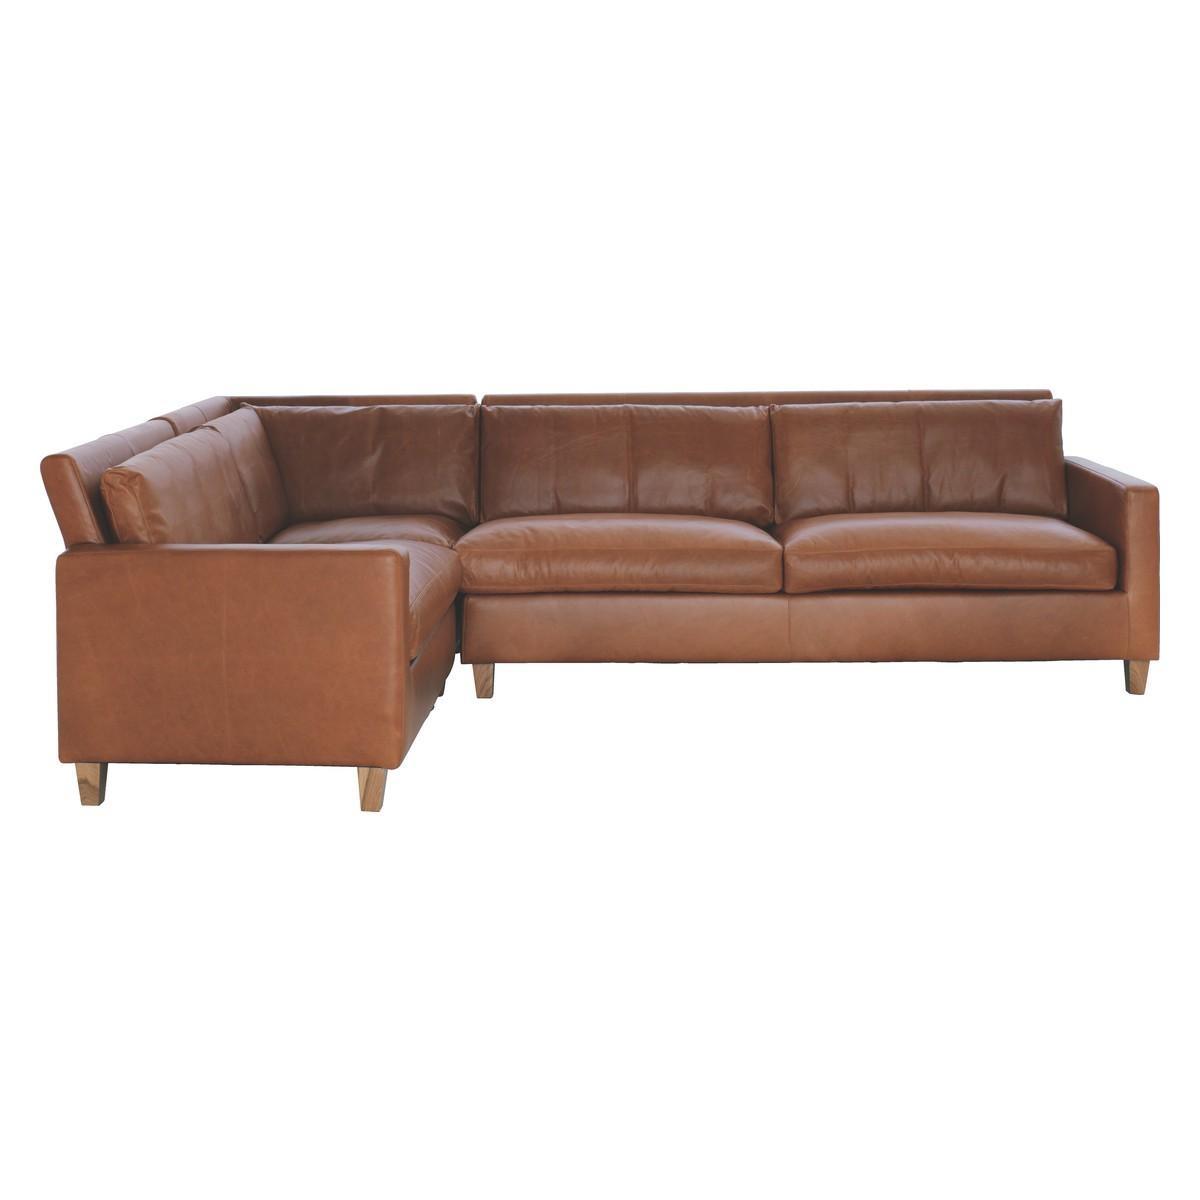 nova black and white leather corner sofa right hand memory foam bed topper 20 inspirations ideas